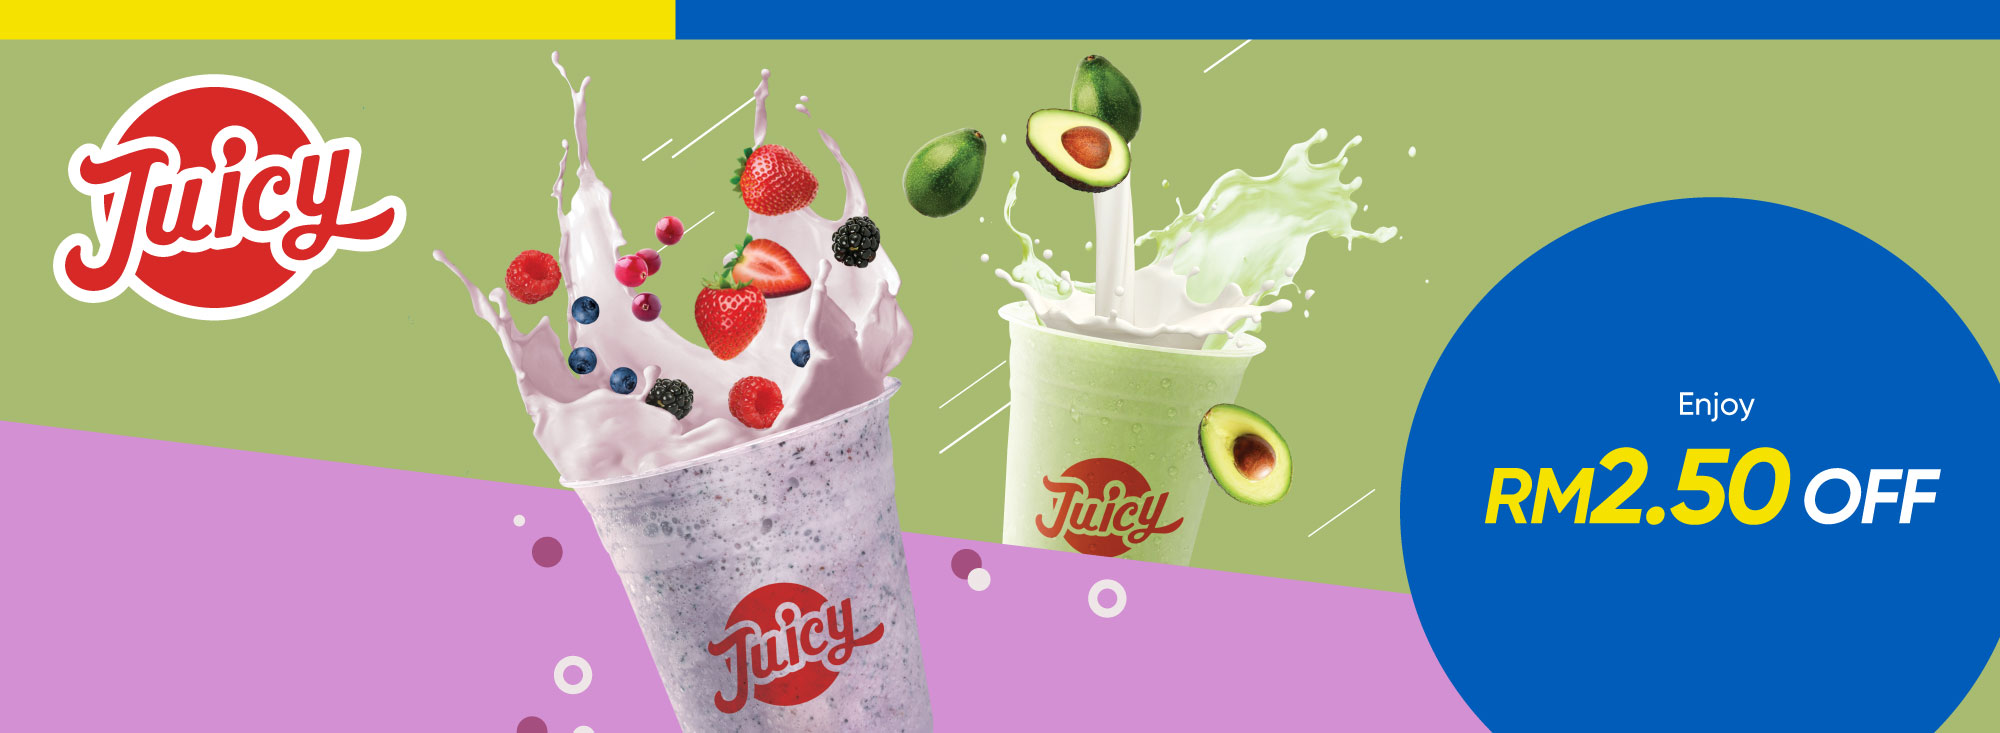 Juicy Fresh Juice Bar Promotion